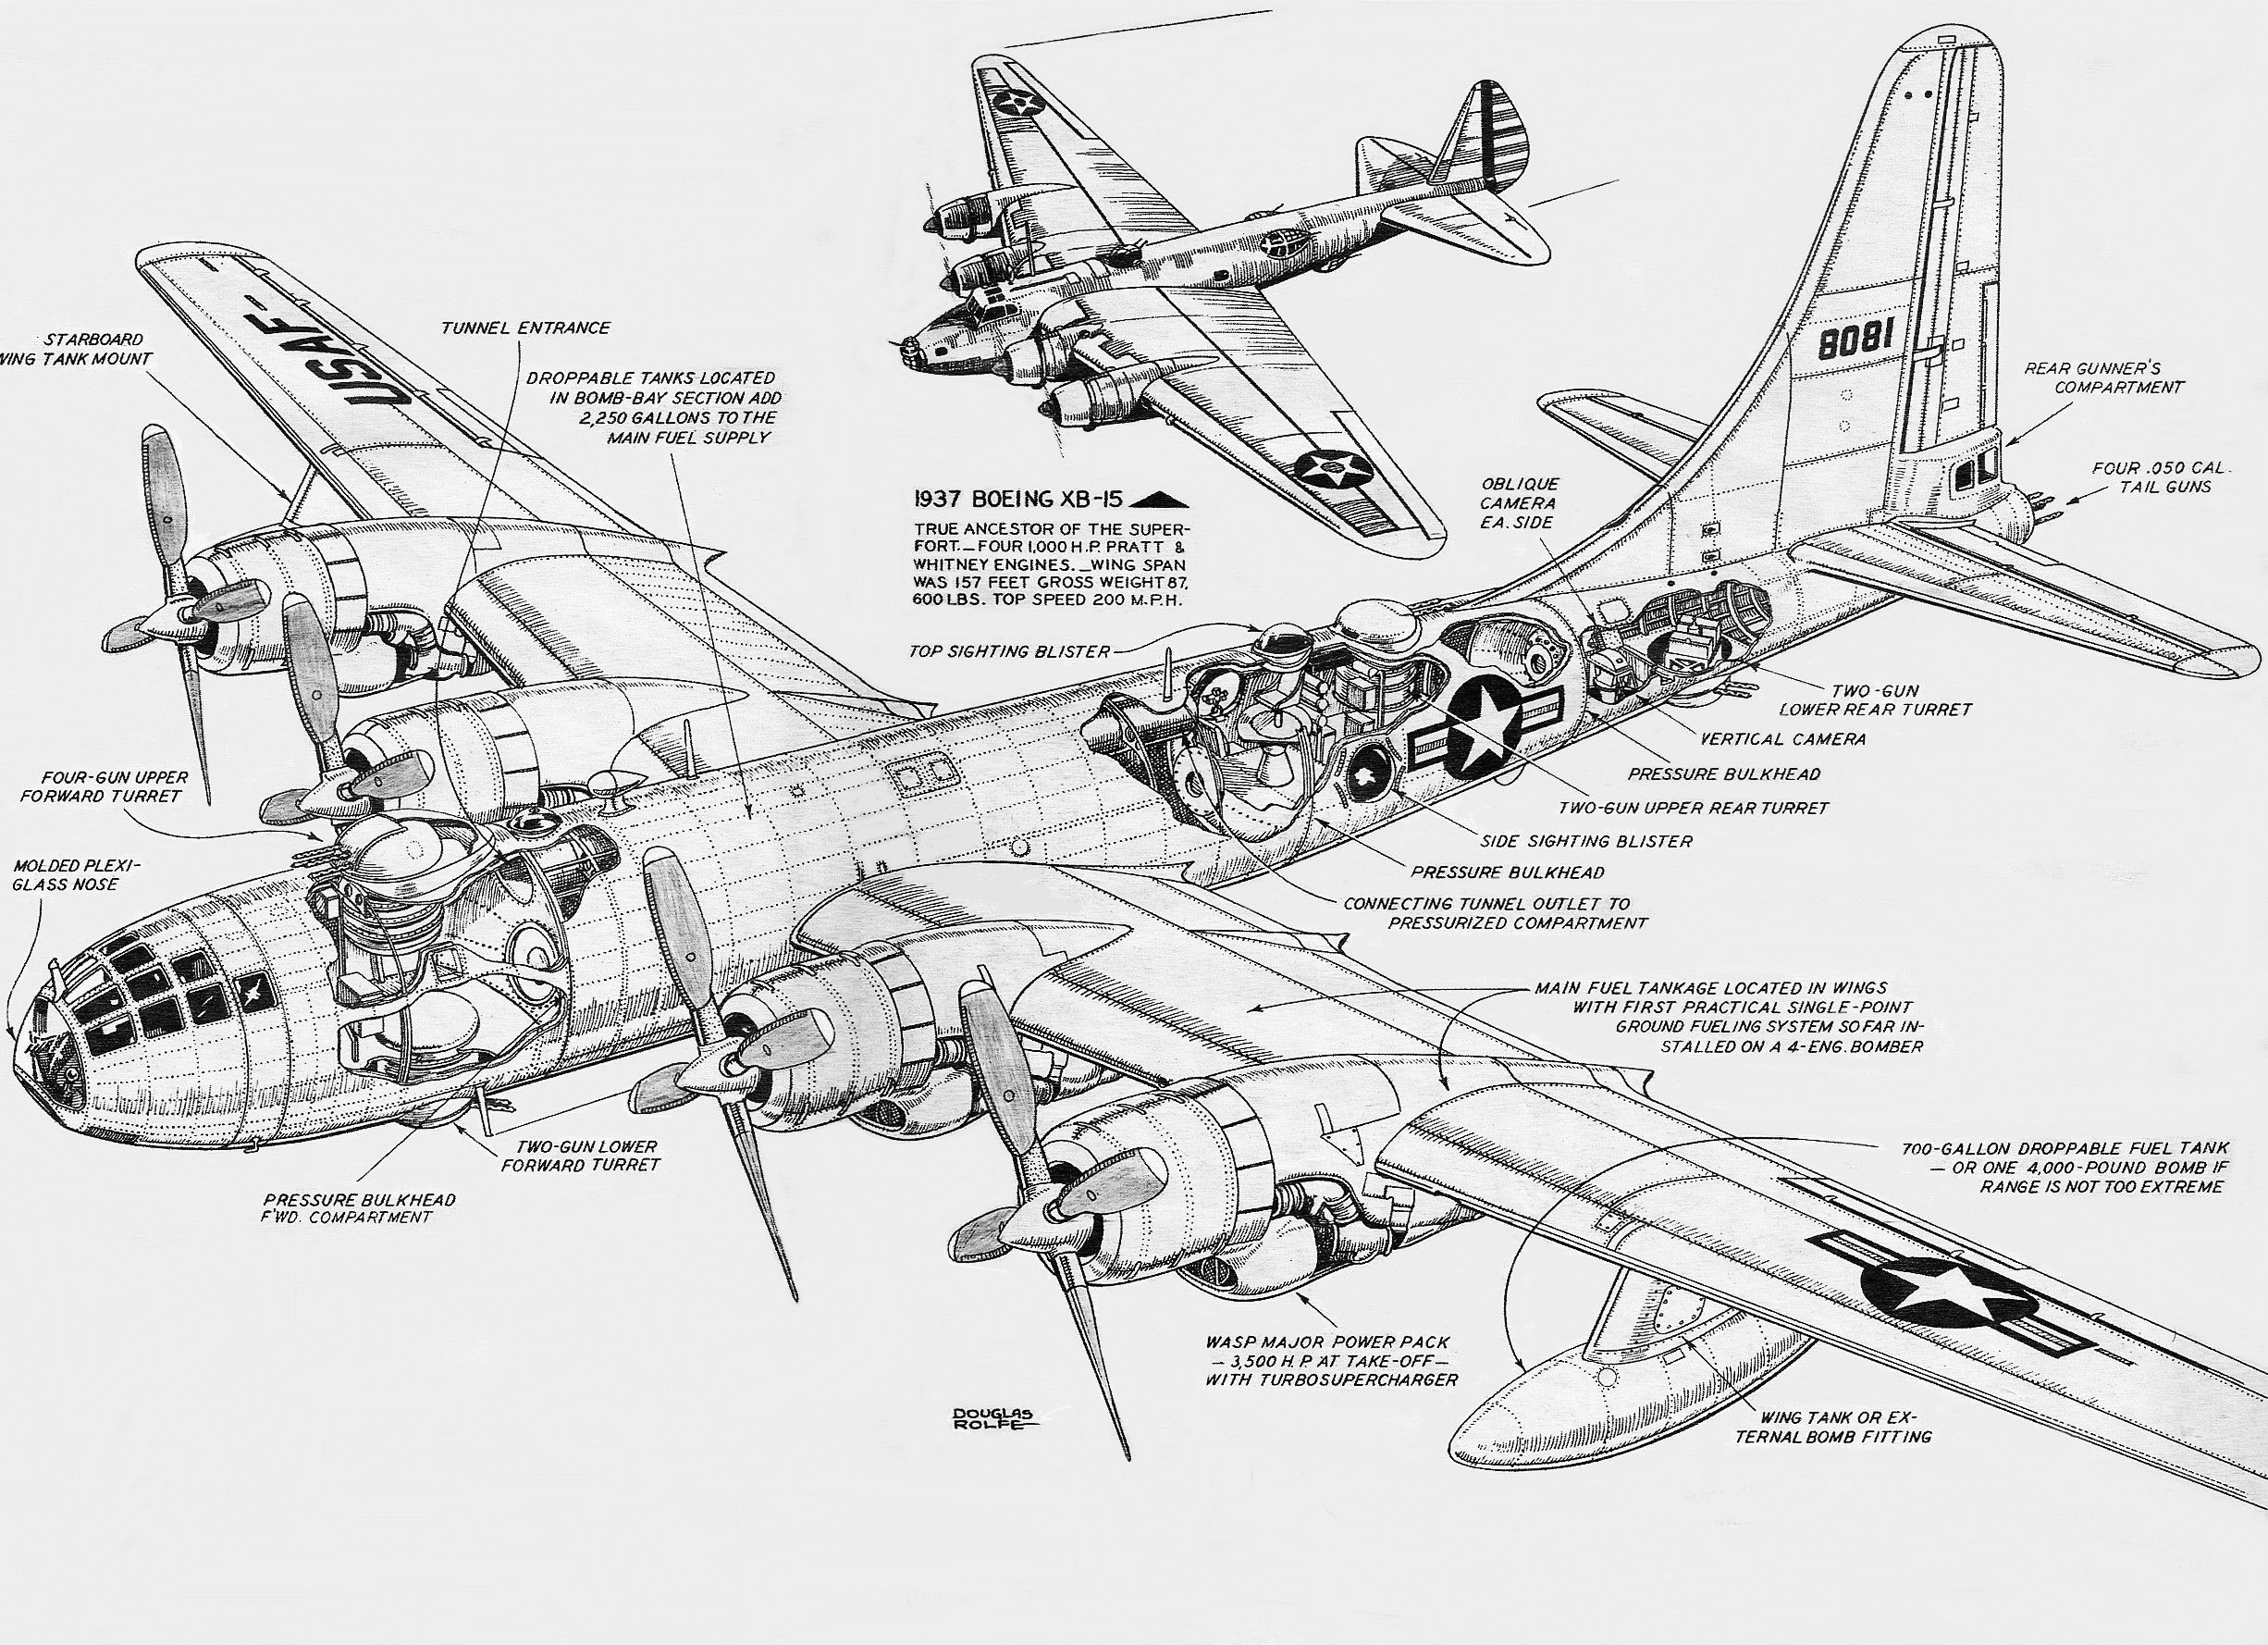 Boeing B 50 Superfortress Is An American Strategicer A Post World War Ii